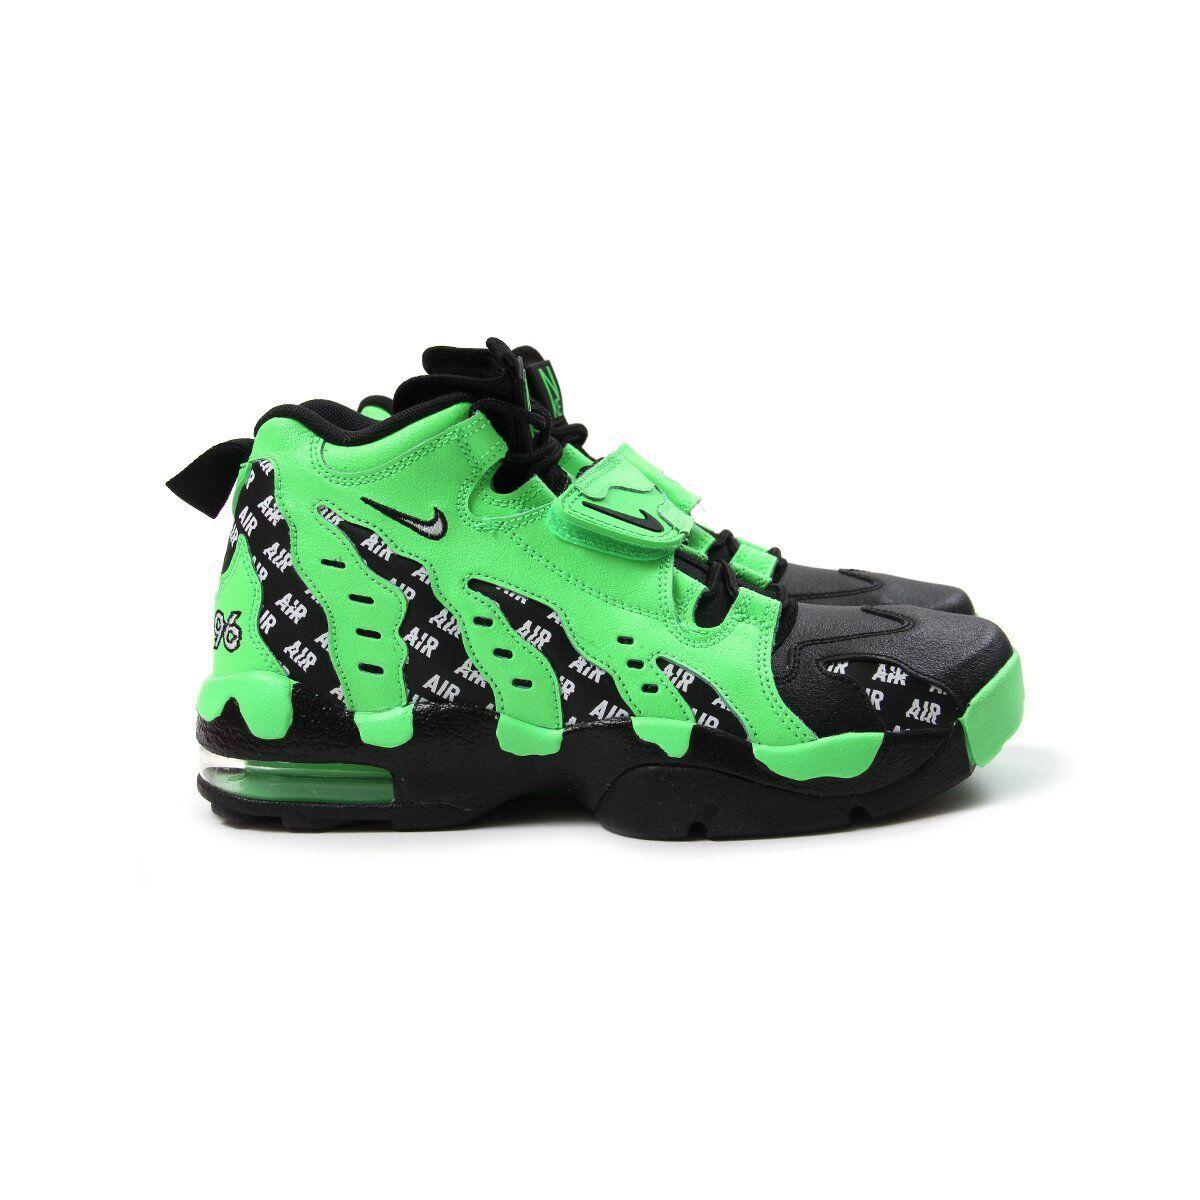 Nike air dt max 95 soa aq5100 dt air 300 deion sanders rabbia uomini verdi sz 7,5 - 13 8c9224